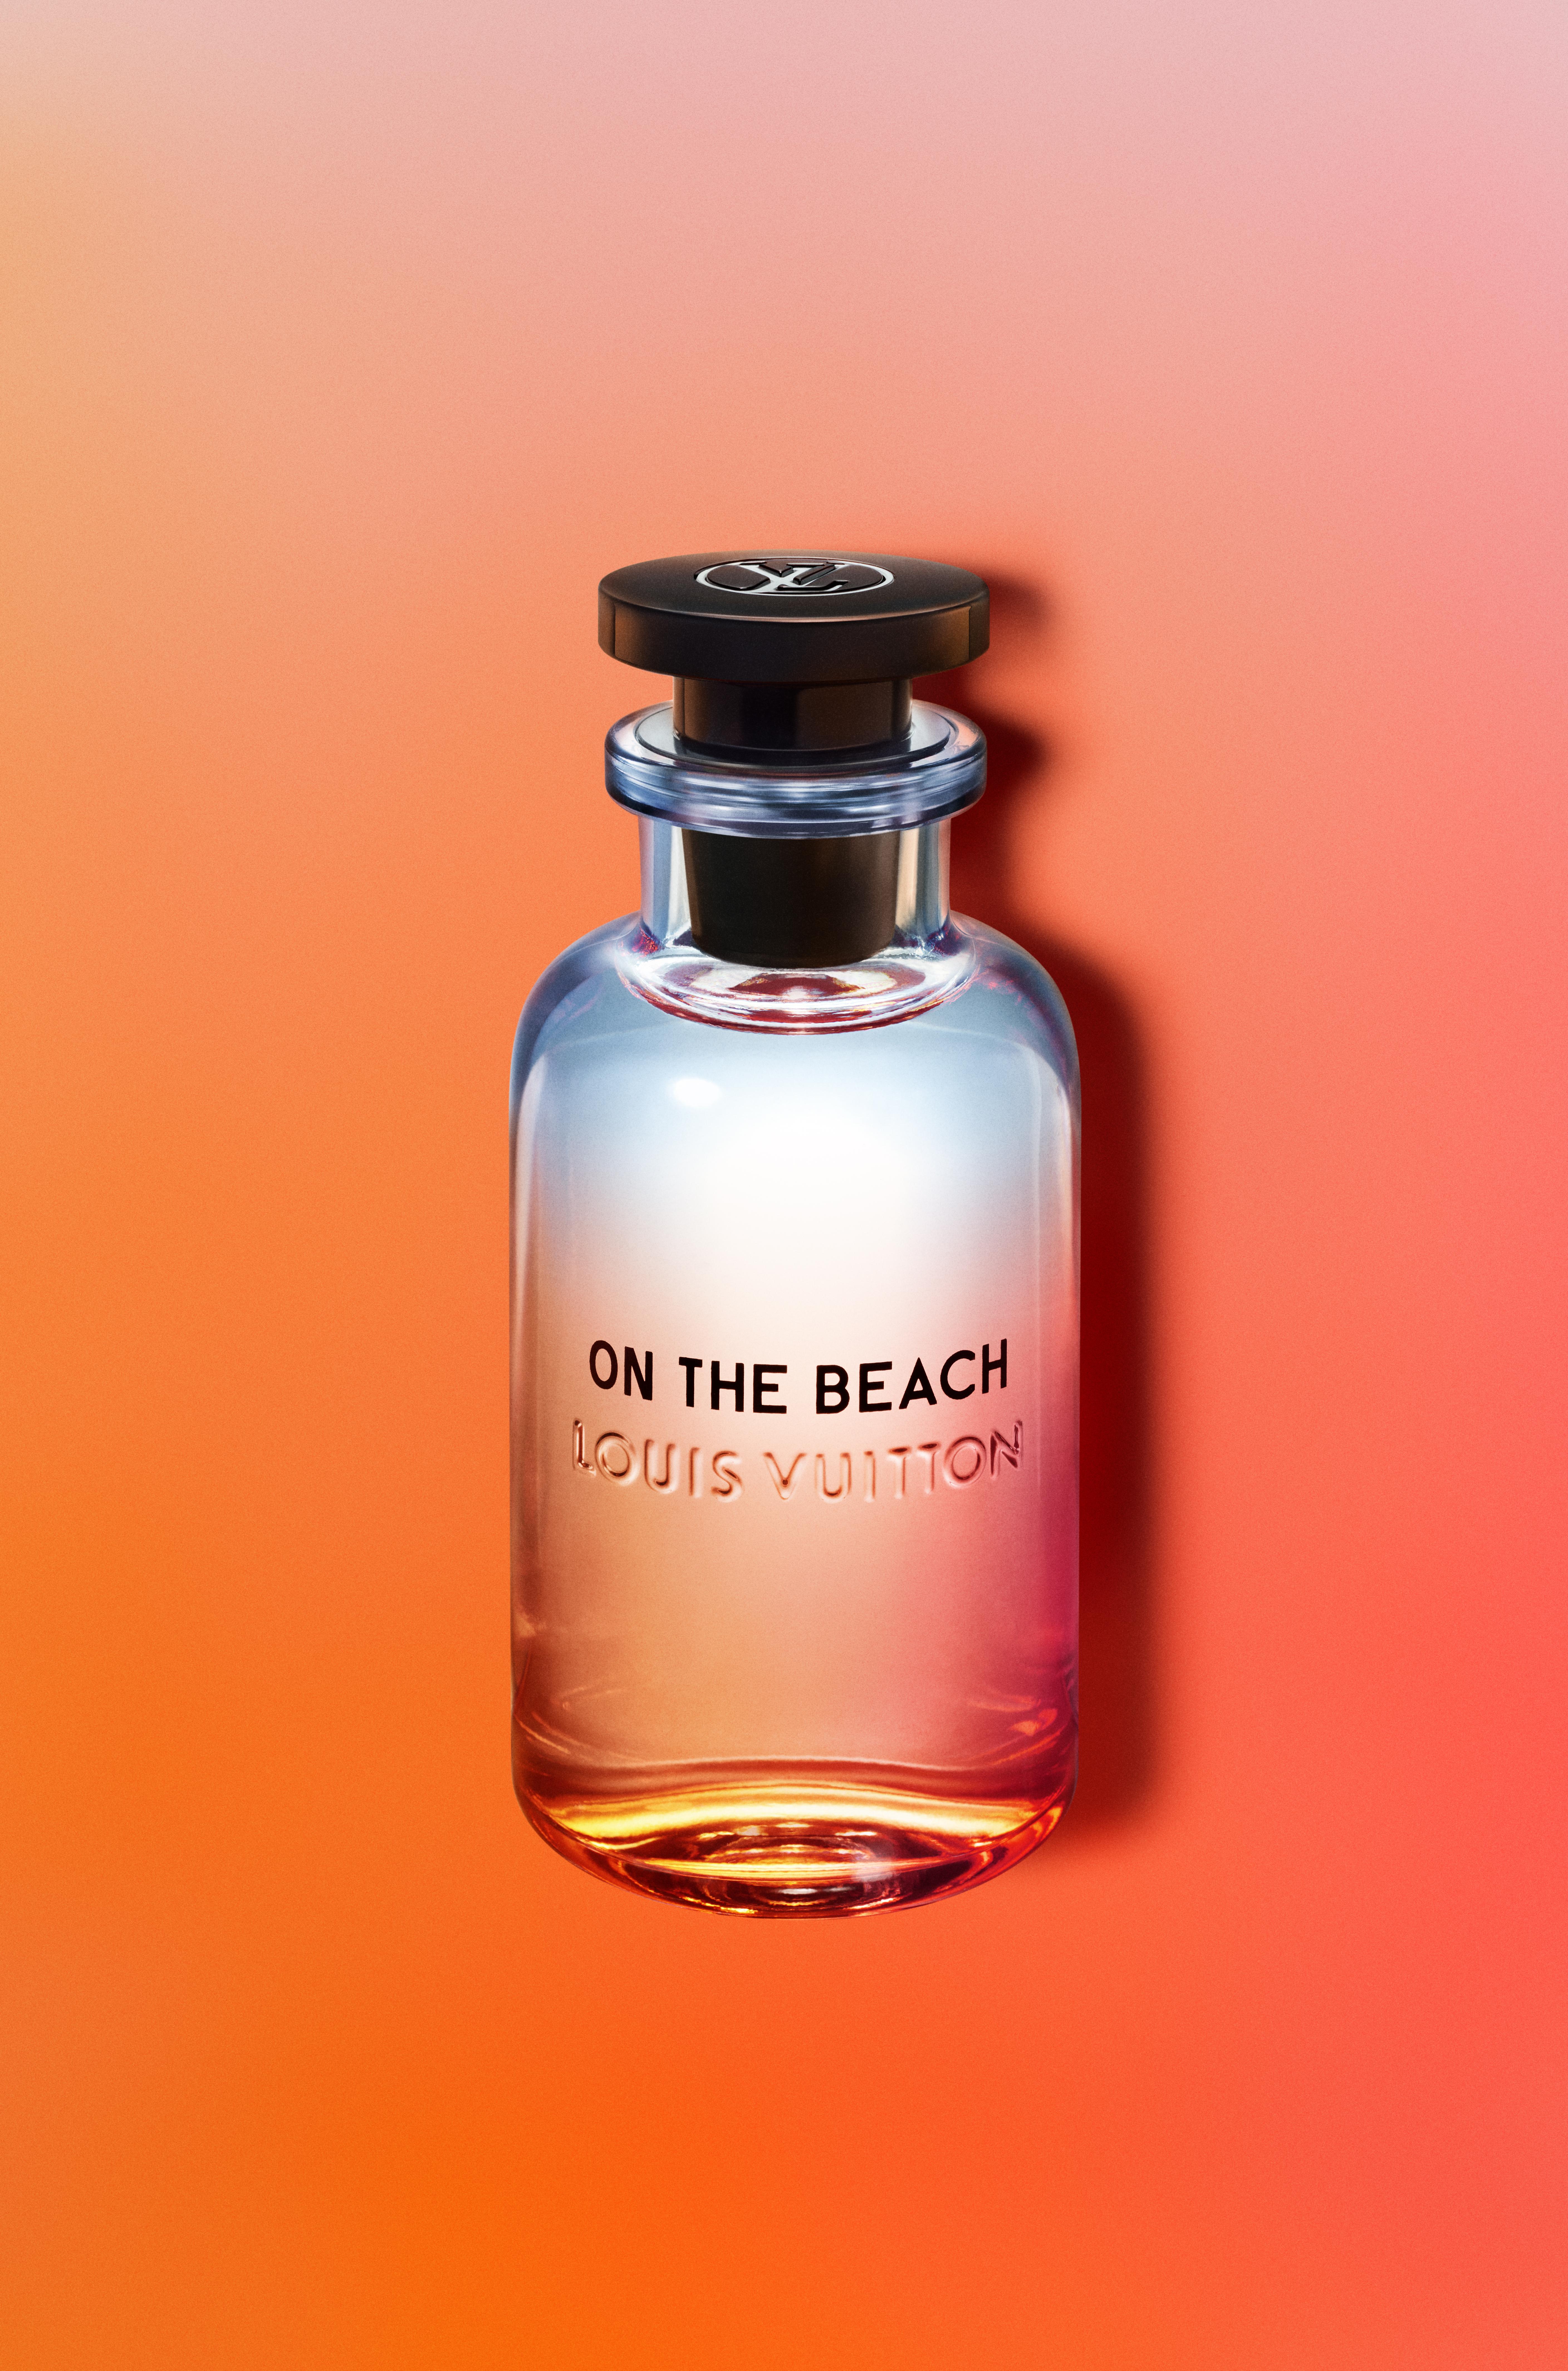 Louis Vuitton lanceert zomers nieuw parfum: On The Beach